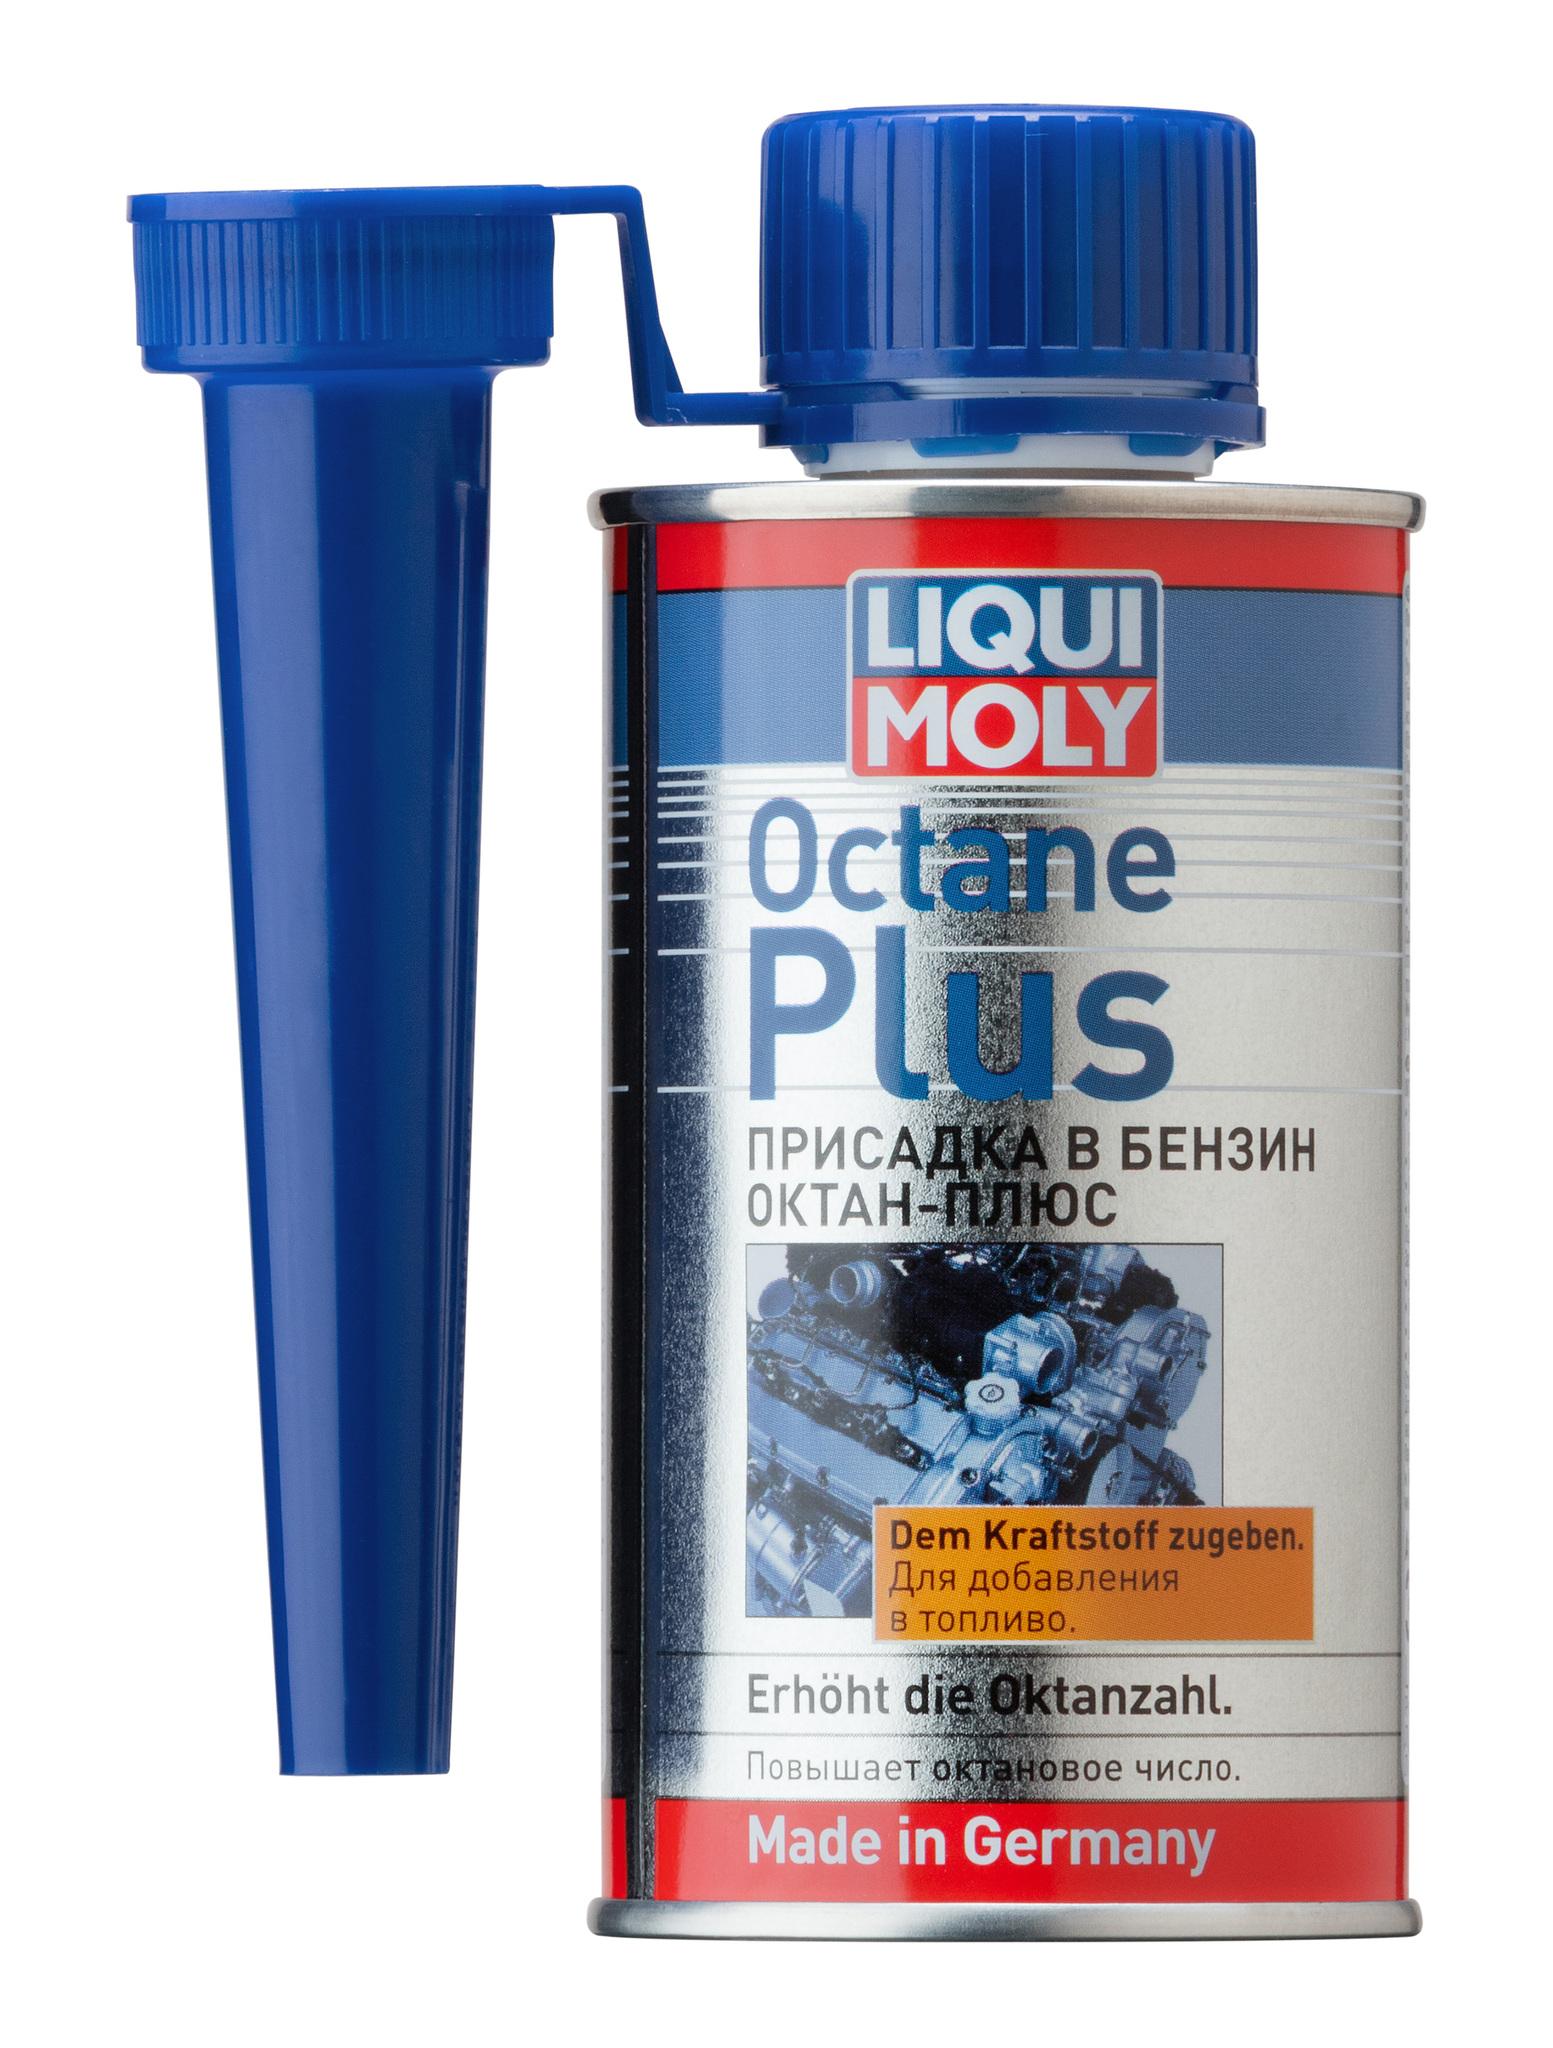 Liqui Moly Octane Plus Присадка в бензин